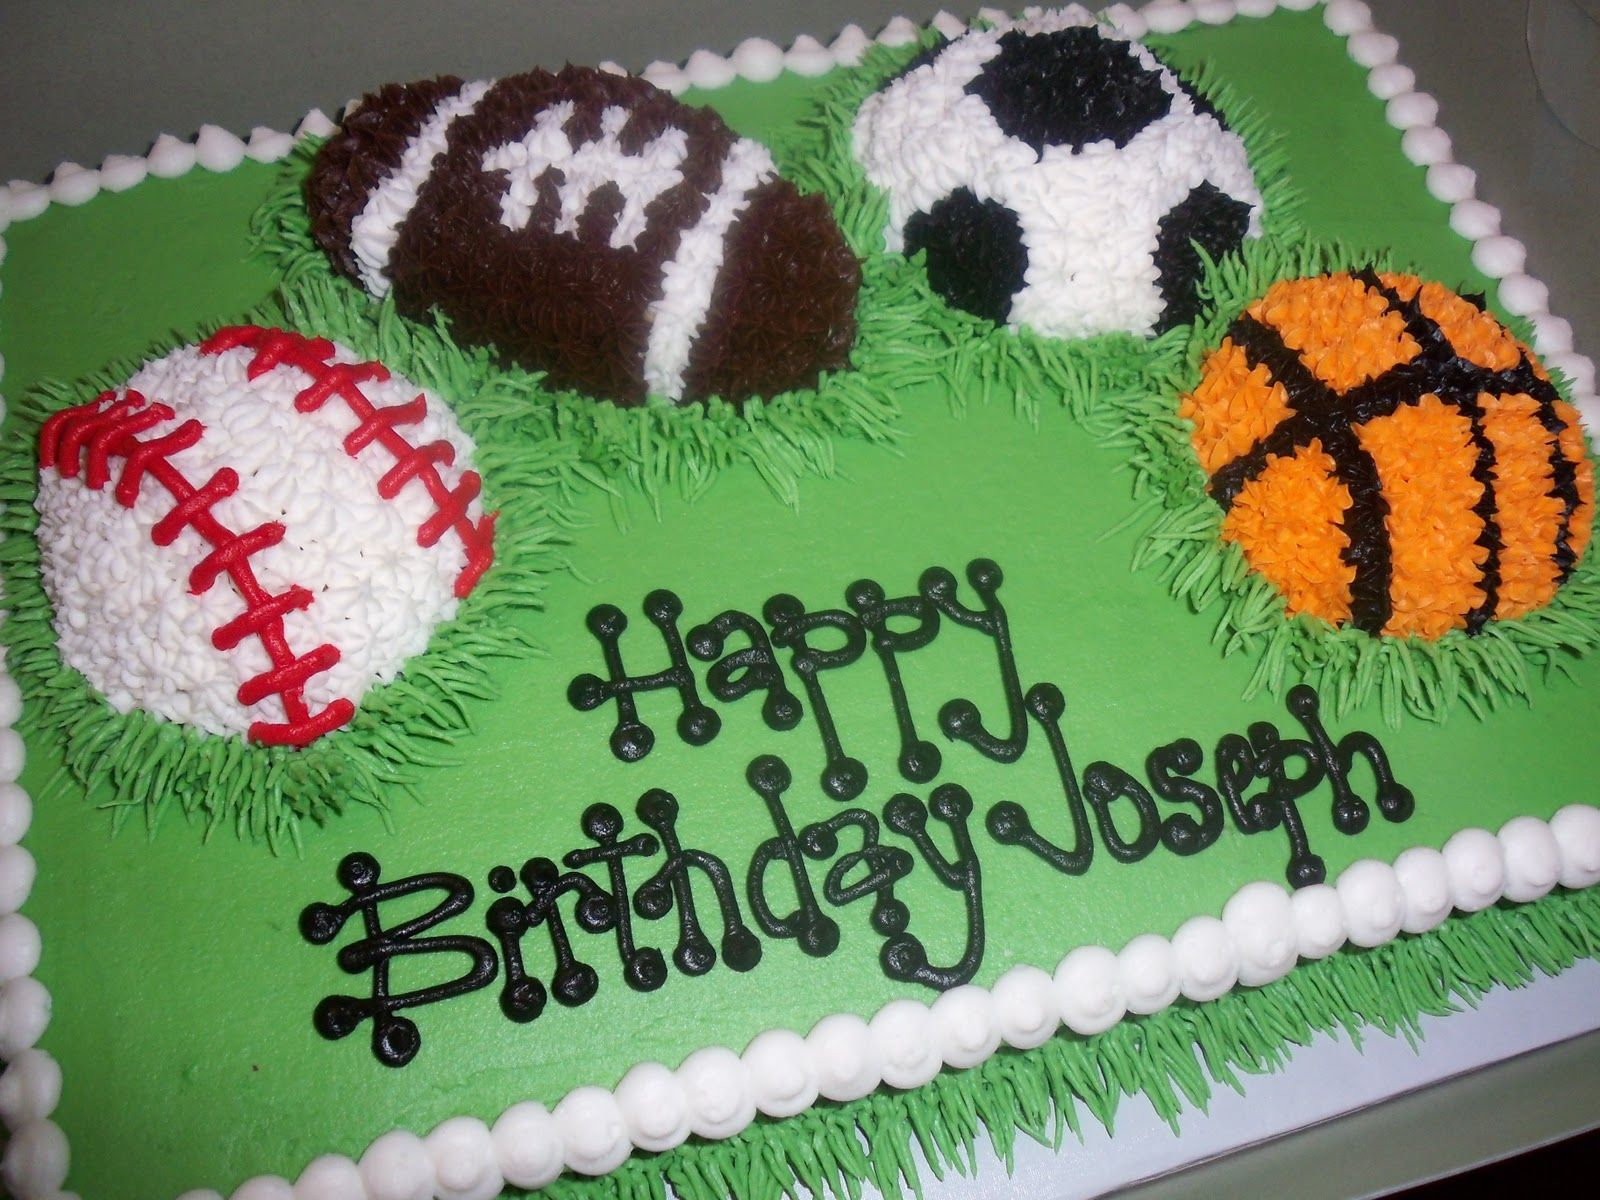 Fabulous Birthday Cakes No Girls Allowed Boy Birthday Cake Funny Birthday Cards Online Bapapcheapnameinfo